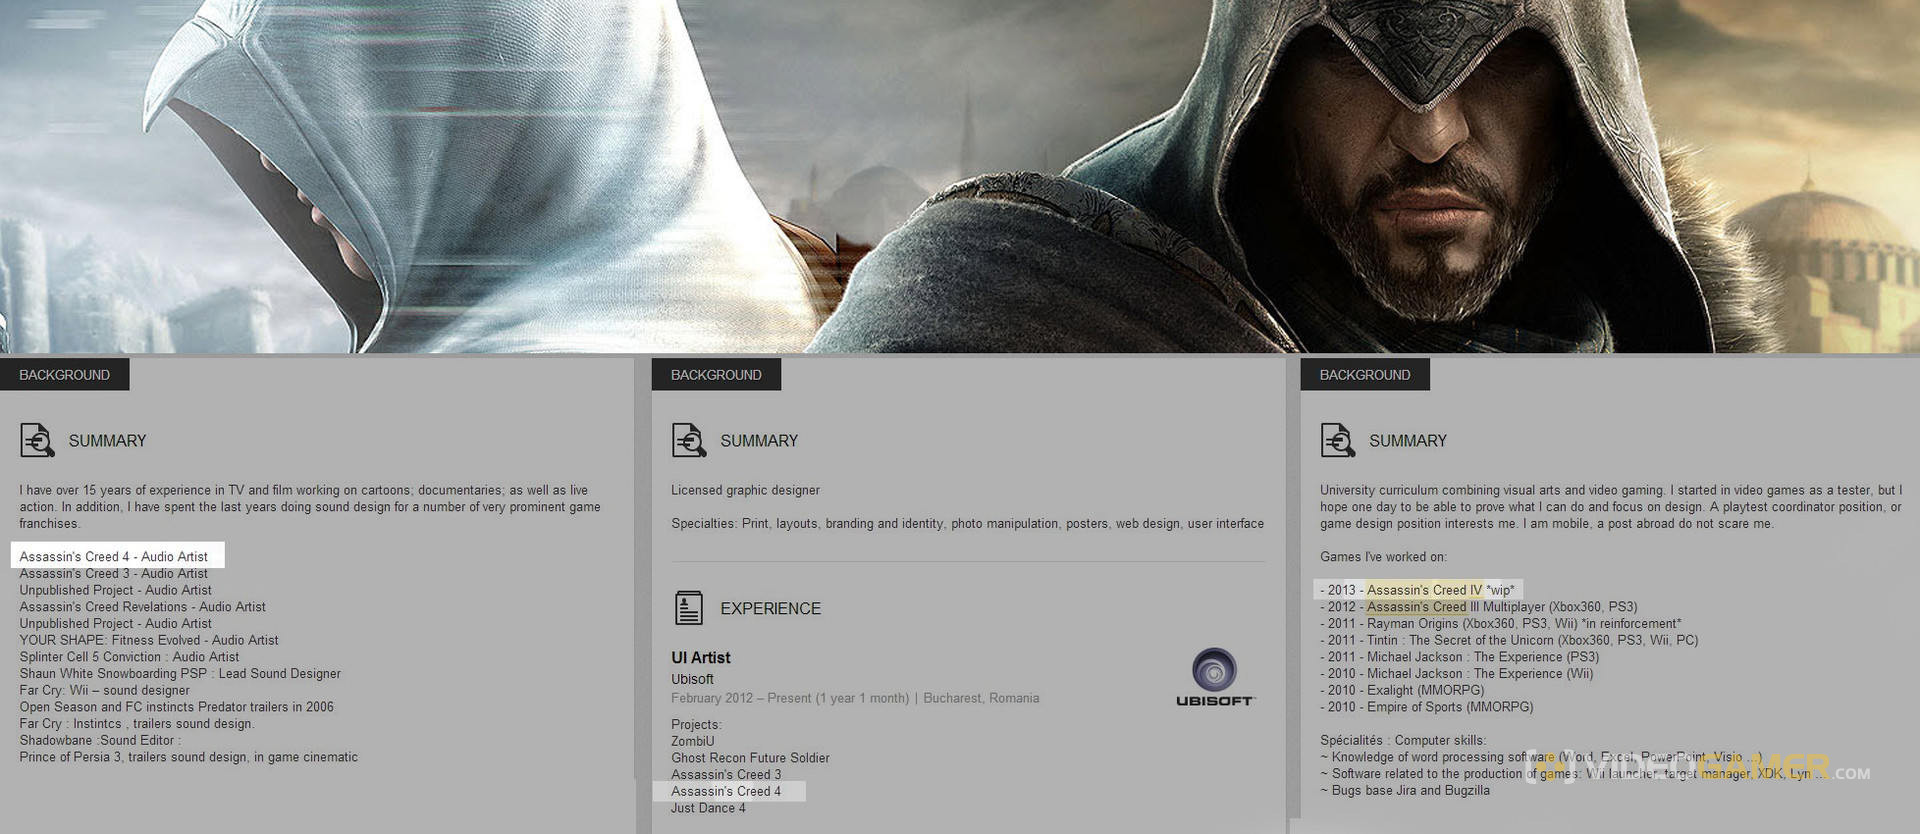 assassins_creed_4.jpg